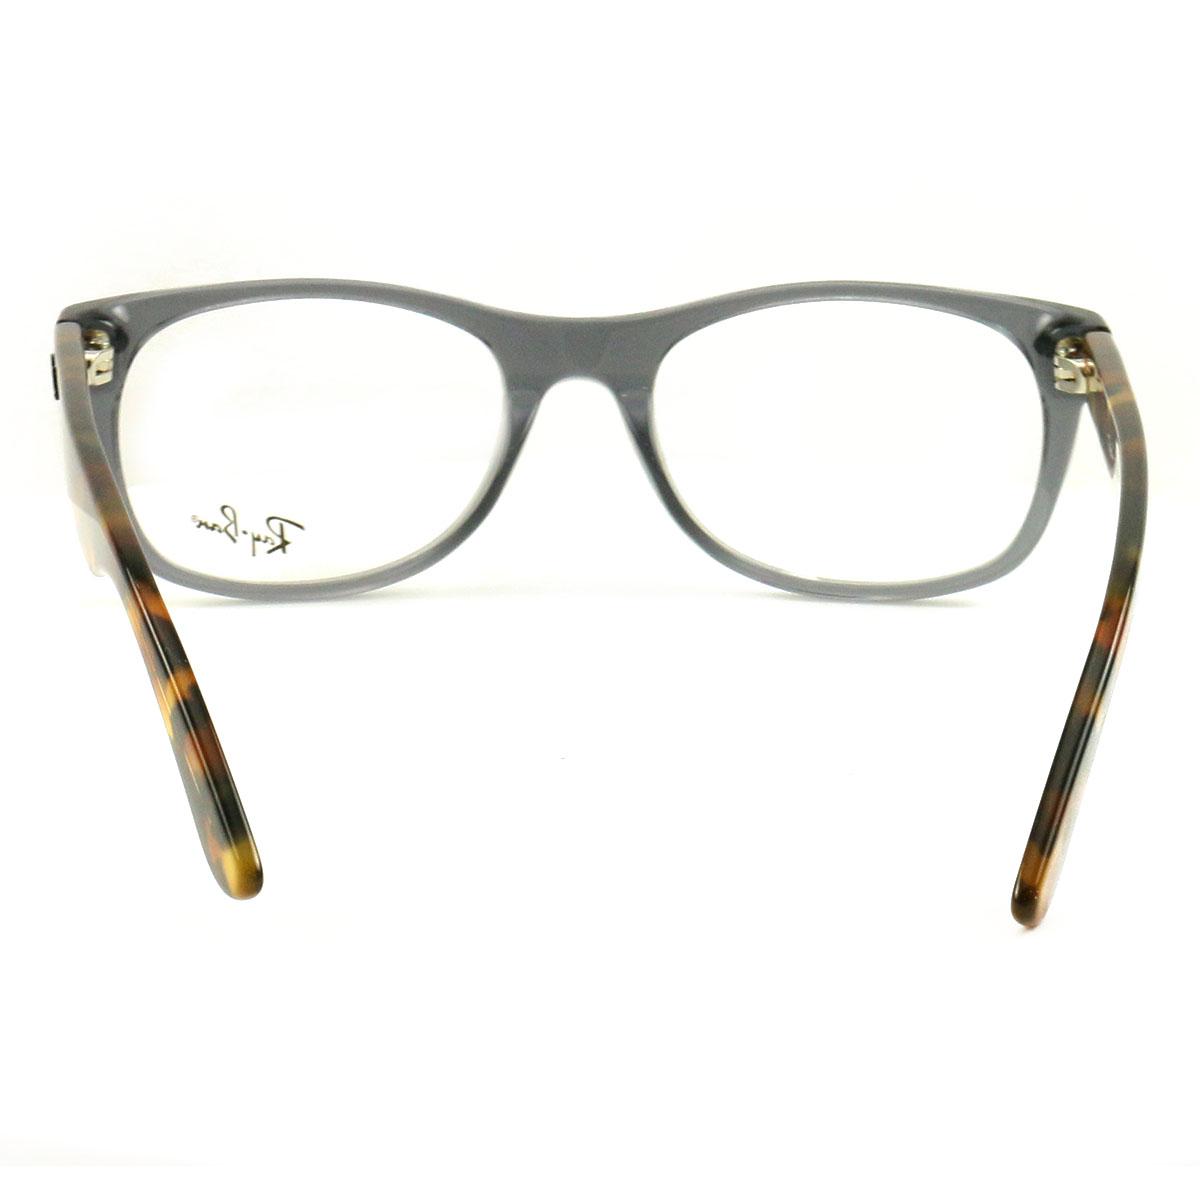 7527c0b7fd Ray-Ban RX5184 Eyeglasses Unisex 5629-52-18-145 Gray Havana Acetate ...